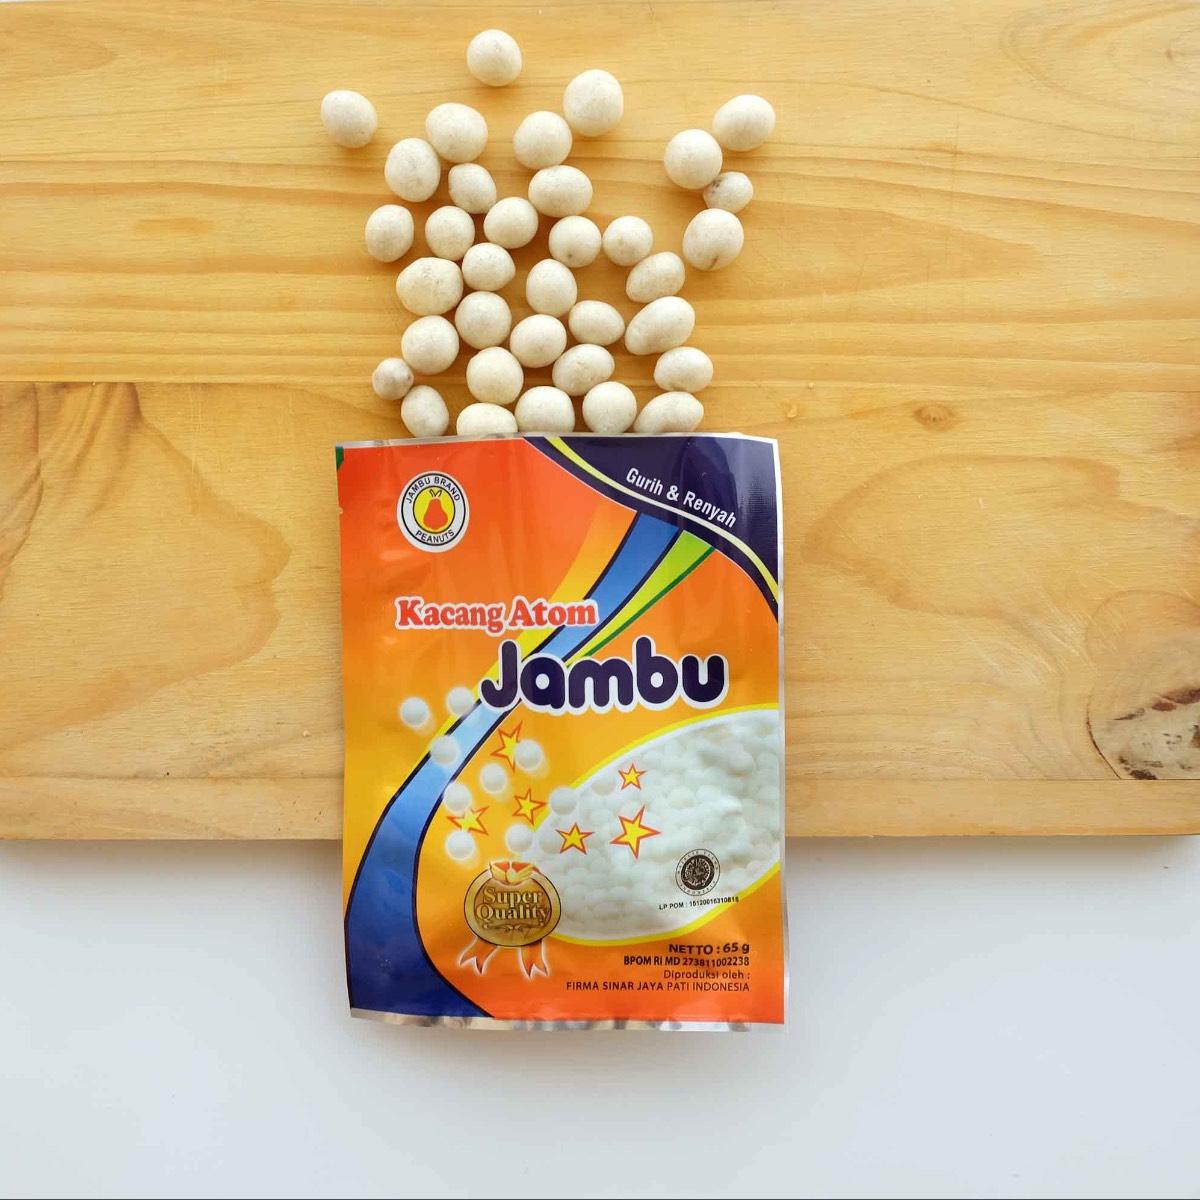 Kacang Atom Jambu Non-msg